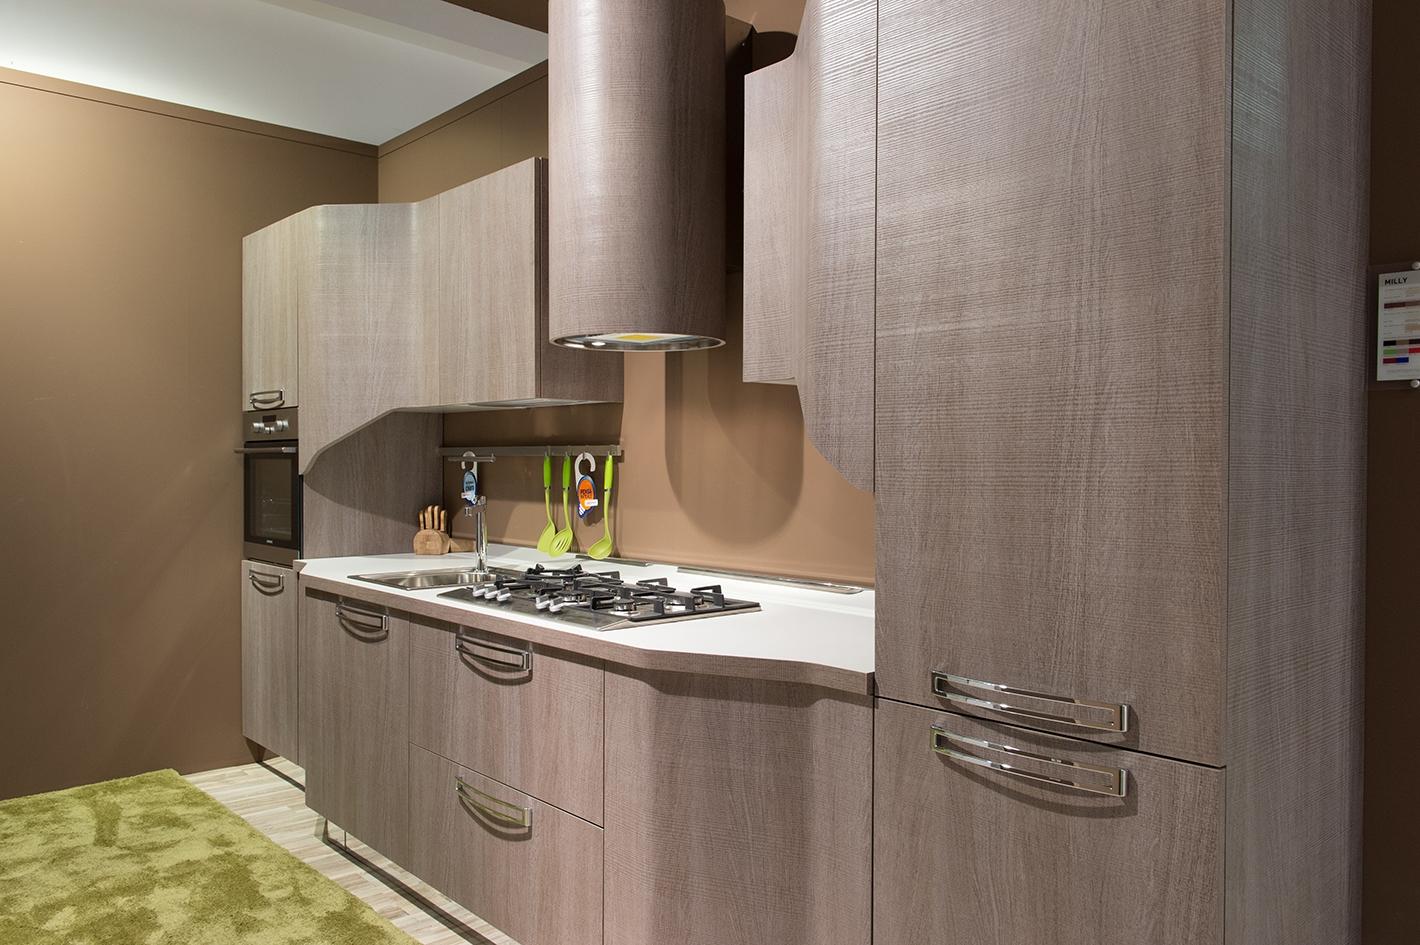 Cucina stosa mod milly completa di elettrodomestici 20239 - Disposizione elettrodomestici cucina ...